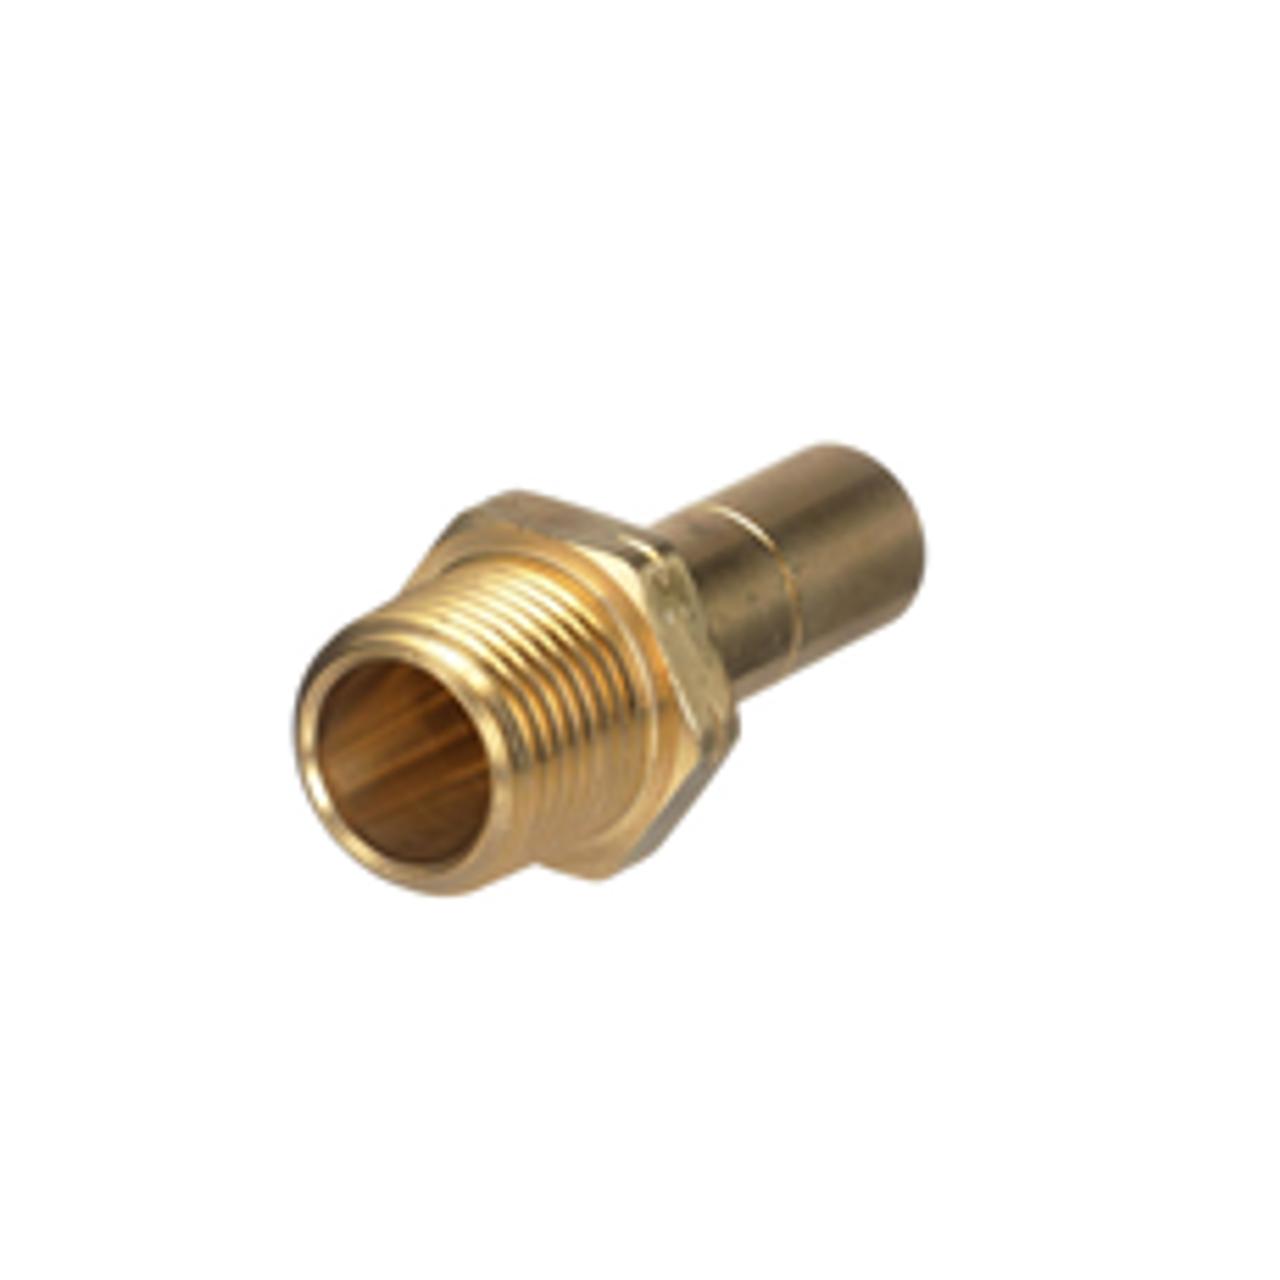 "15mm x ½"" MPT Brass stem adapter 1229-0815"